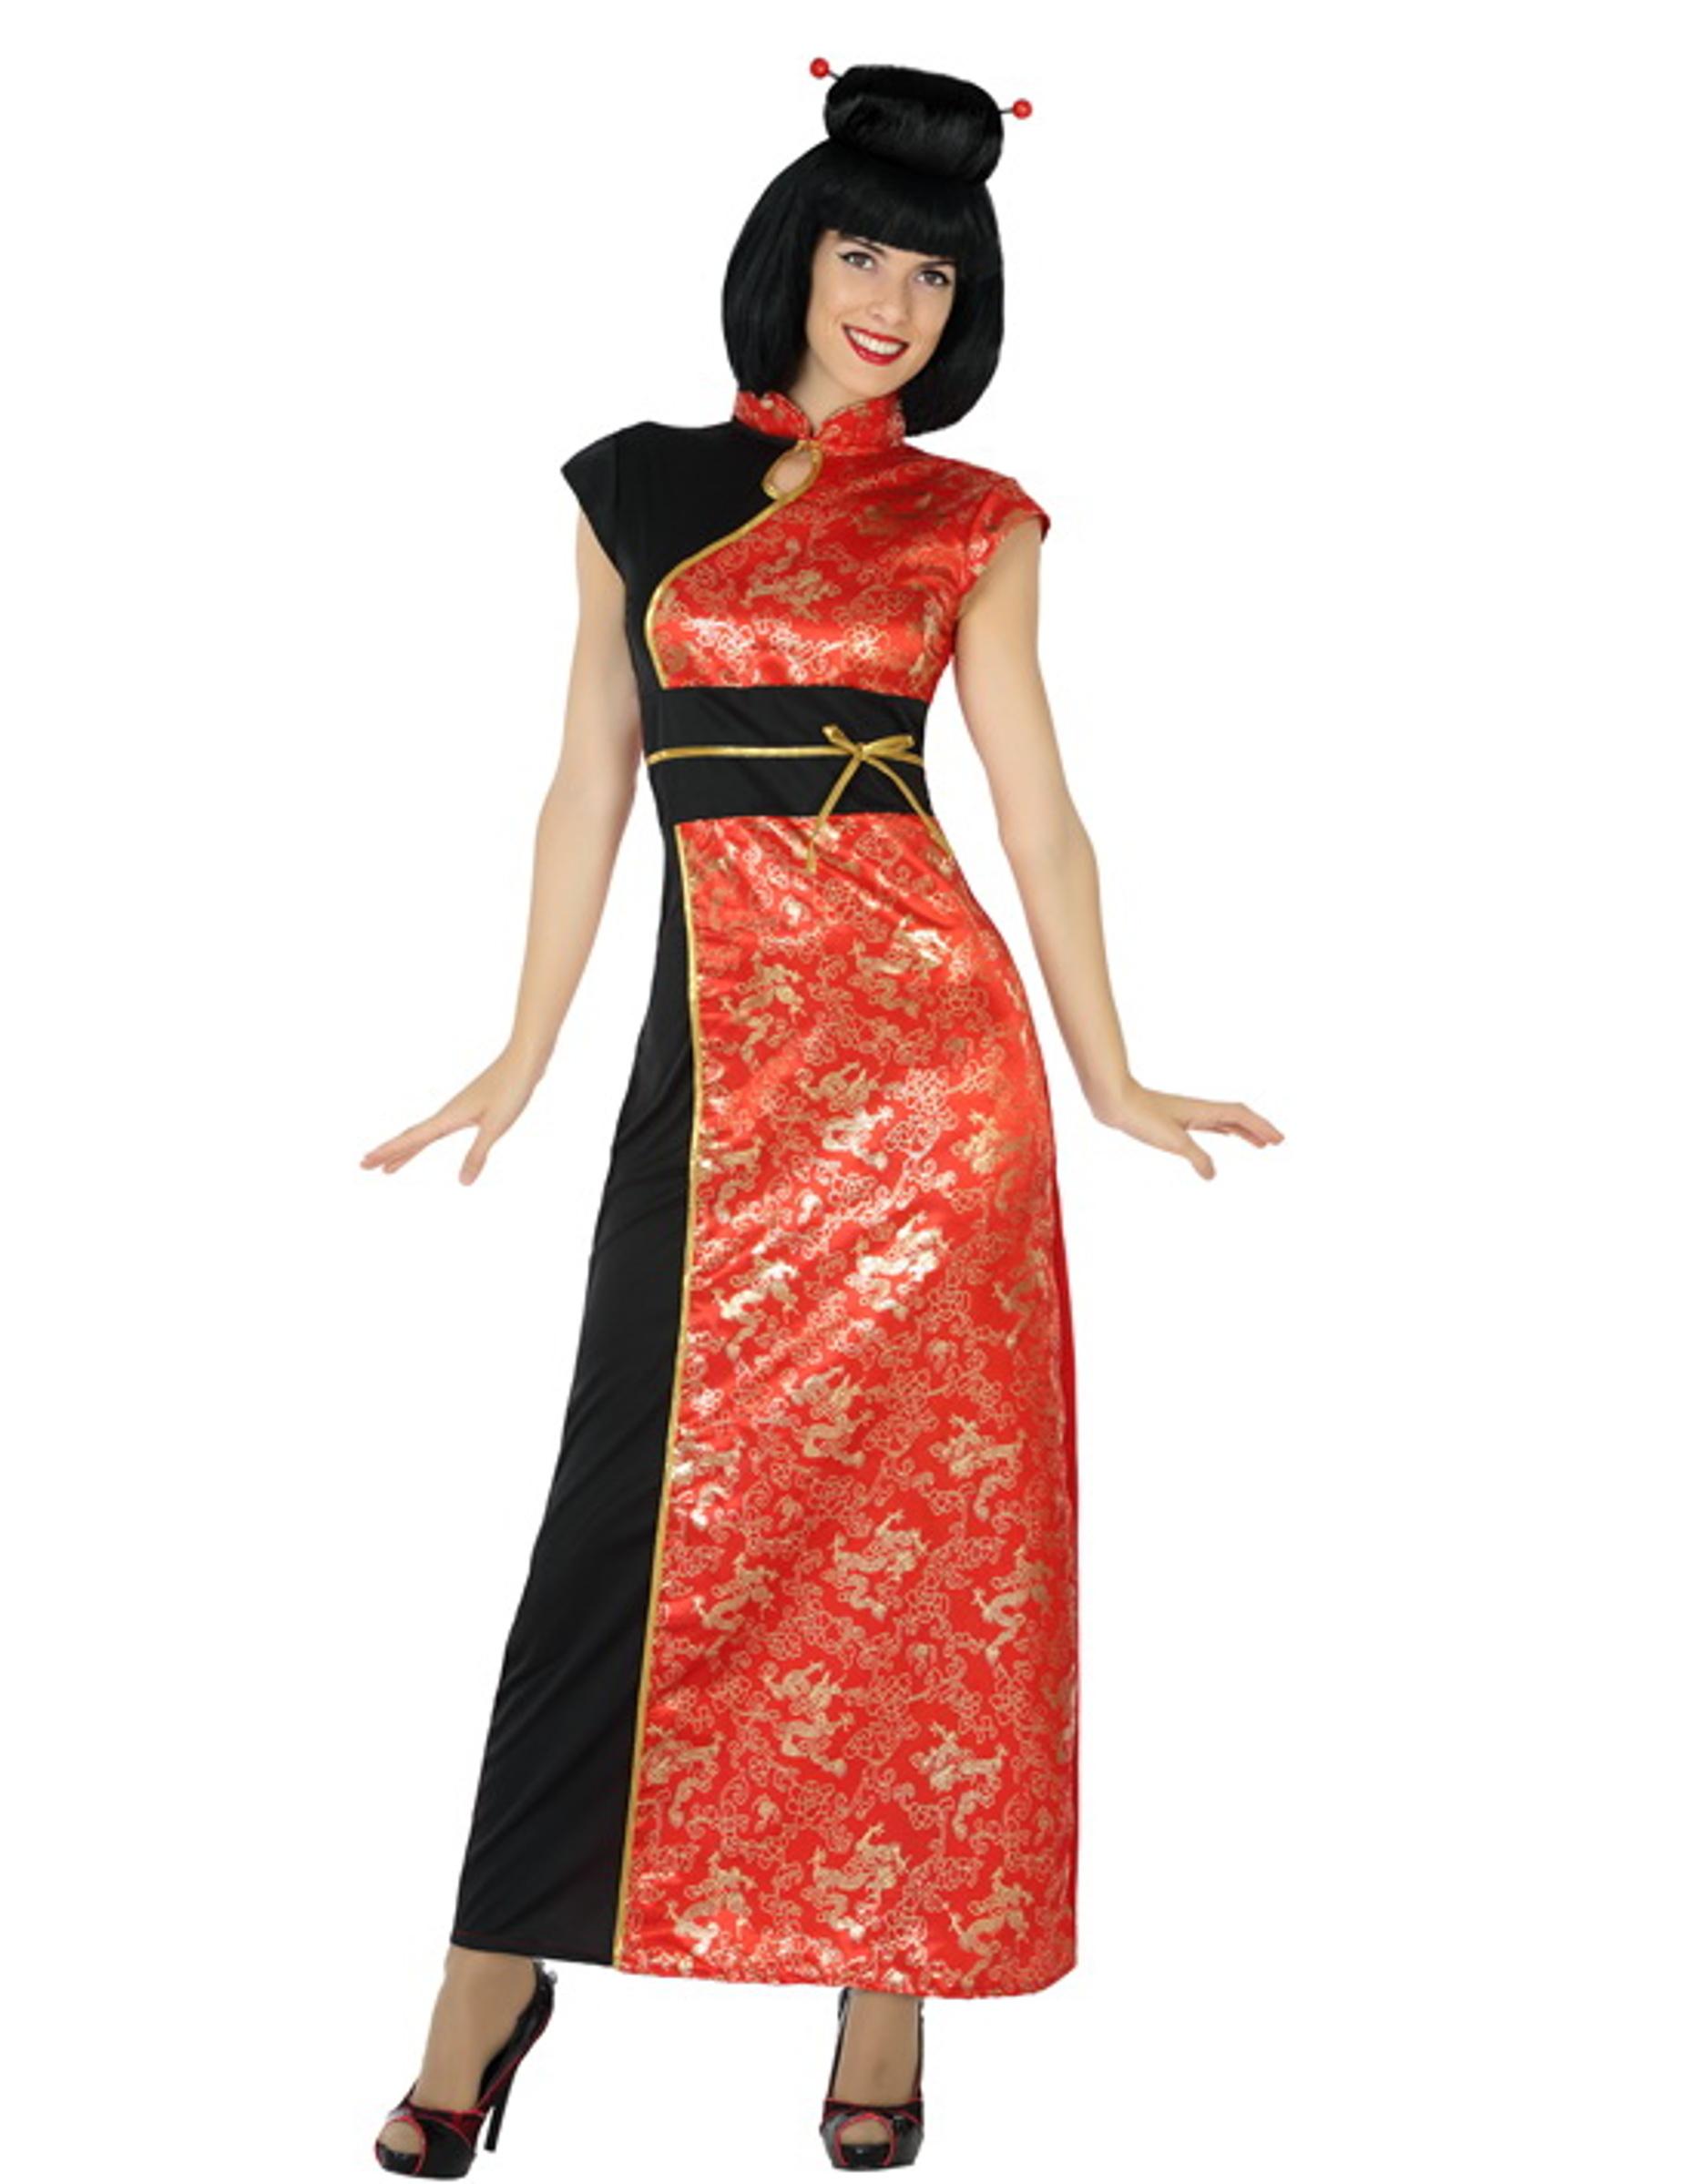 elegante chinesin damenkost m asiatin plus size rot g nstige faschings kost me bei karneval. Black Bedroom Furniture Sets. Home Design Ideas